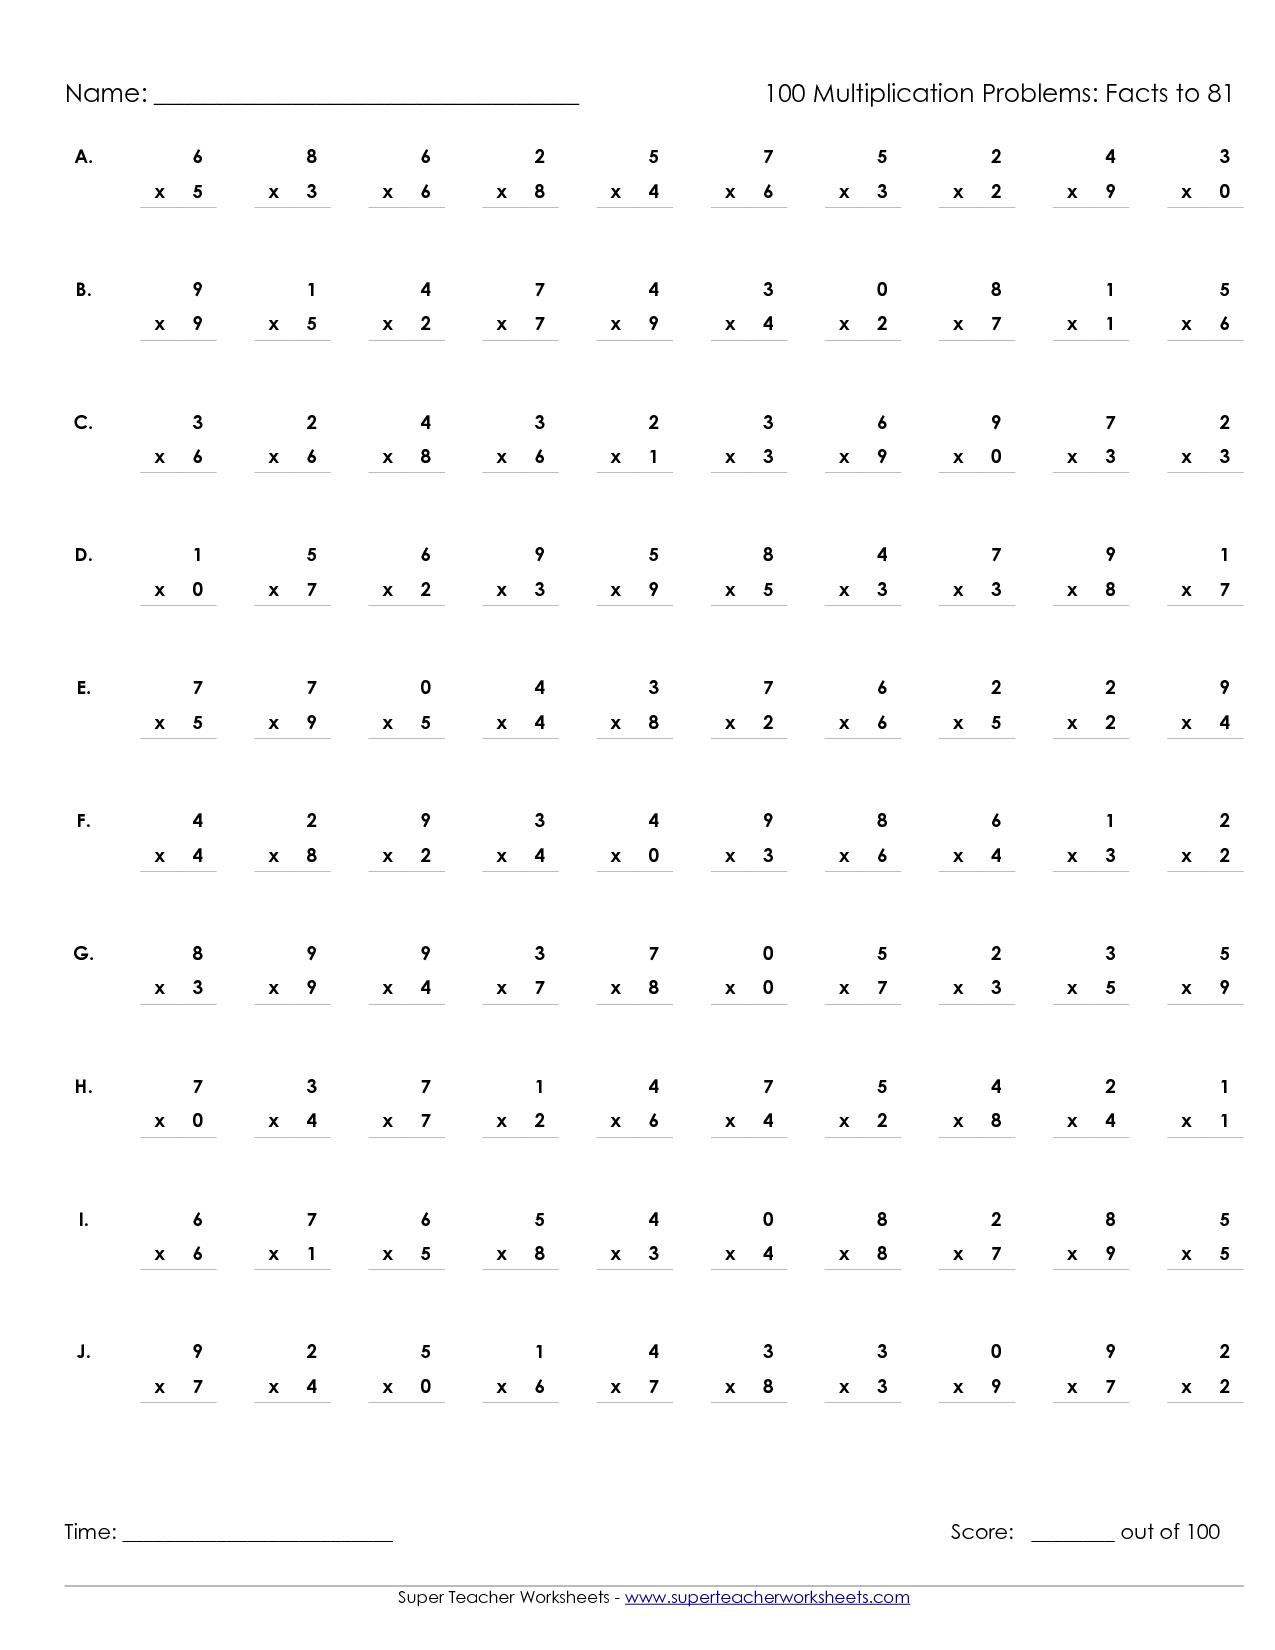 Printable Multiplication Worksheets 100 Problems | Math' S - Free Printable Multiplication Speed Drills